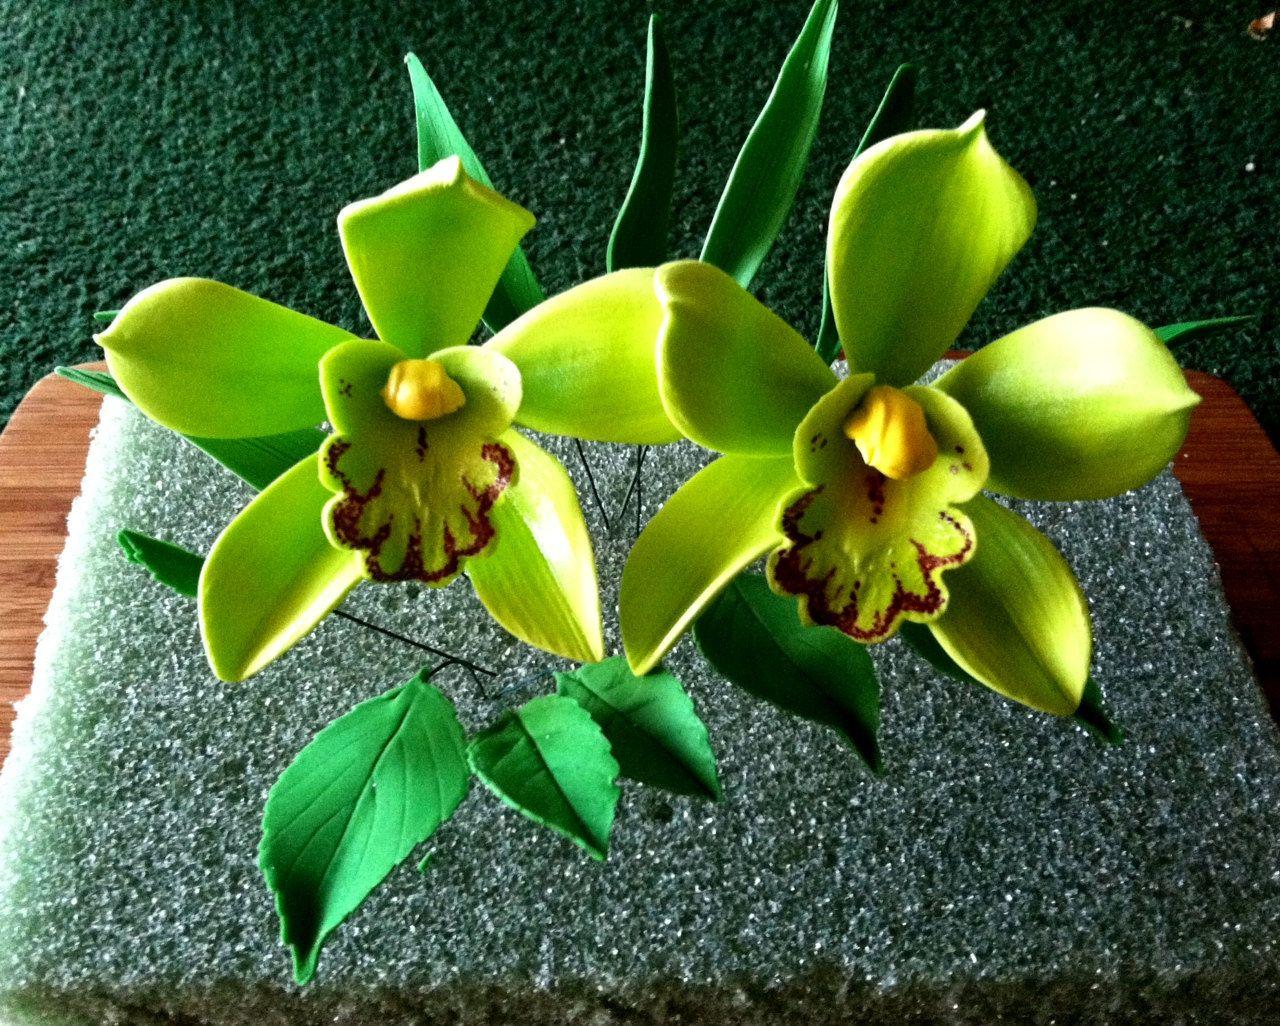 Cymbidium gumpaste cymbidium orchid cake decoration by pin gum paste orchid wedding cake toppers for sale cakes izmirmasajfo